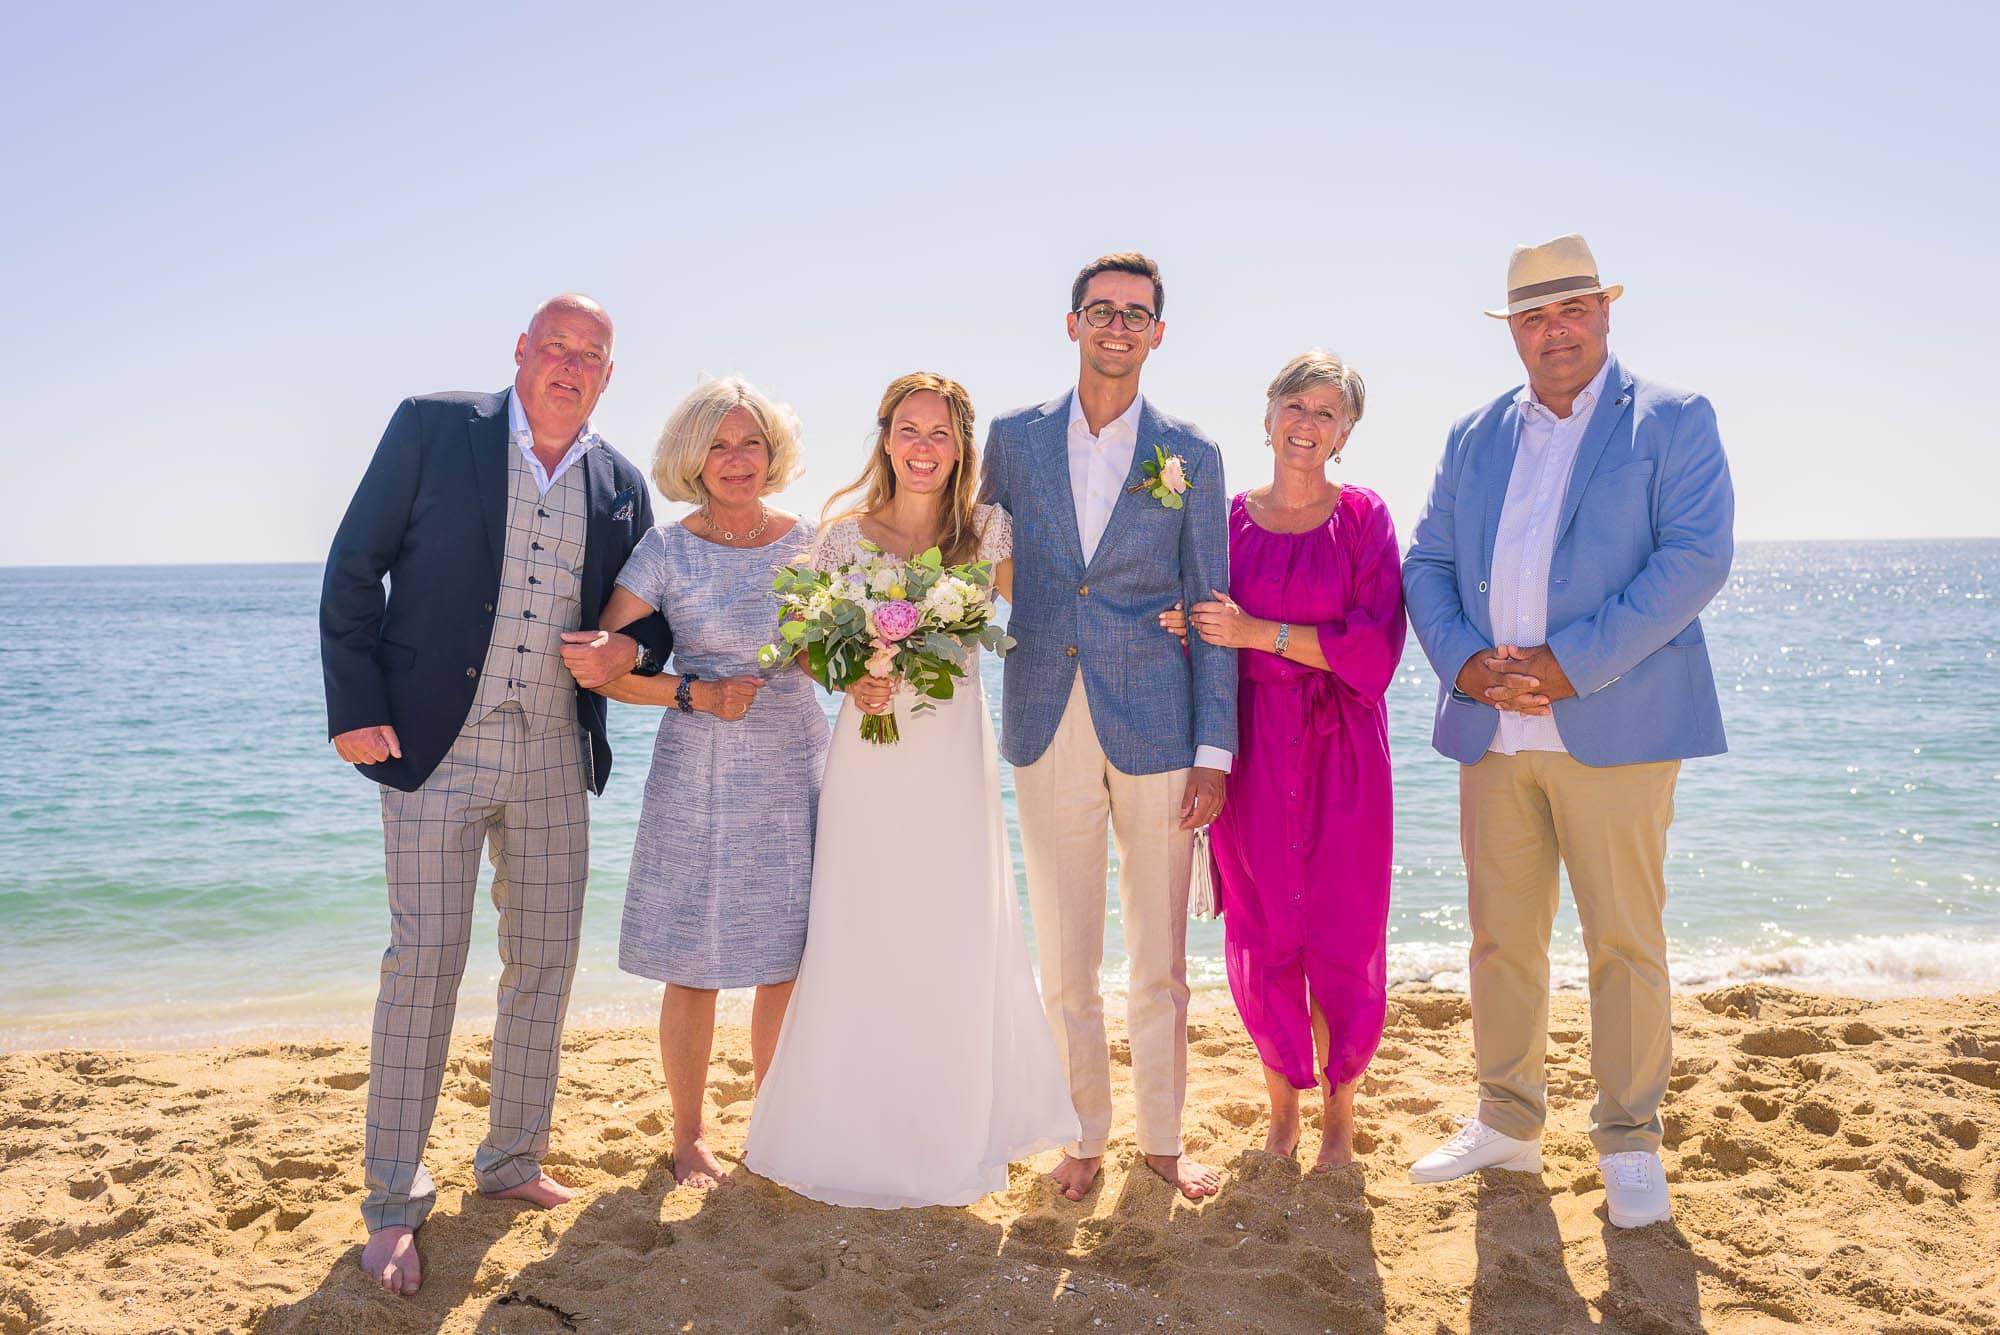 032_Alan_and_Heidi_Wedding_Verena_Andreas